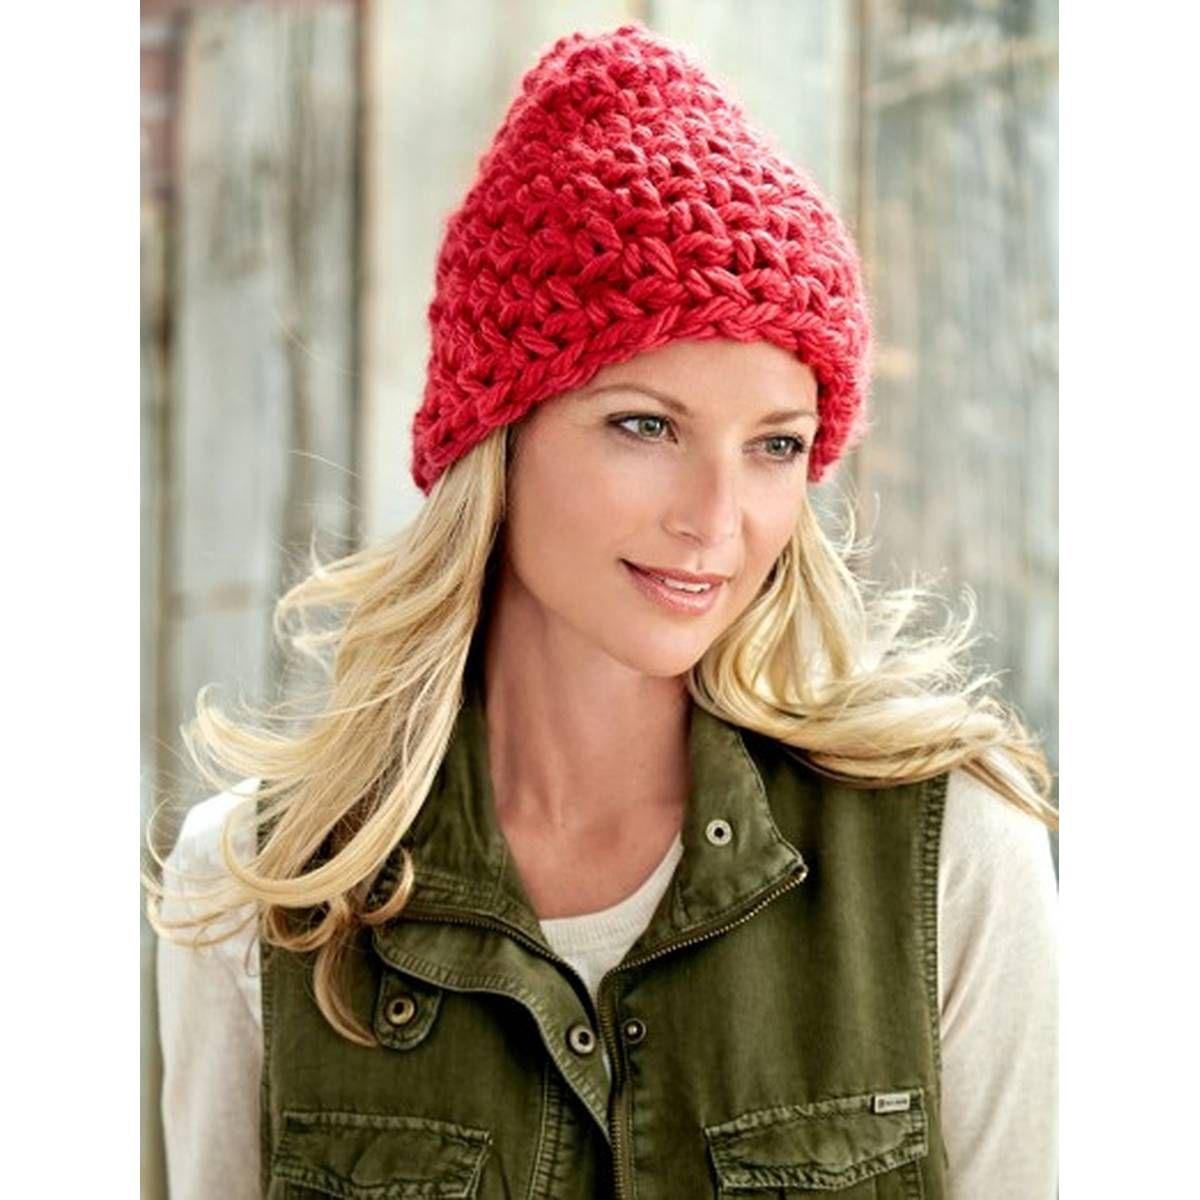 Pin by Marvel Sheffield on Crochet patterns Crochet hats